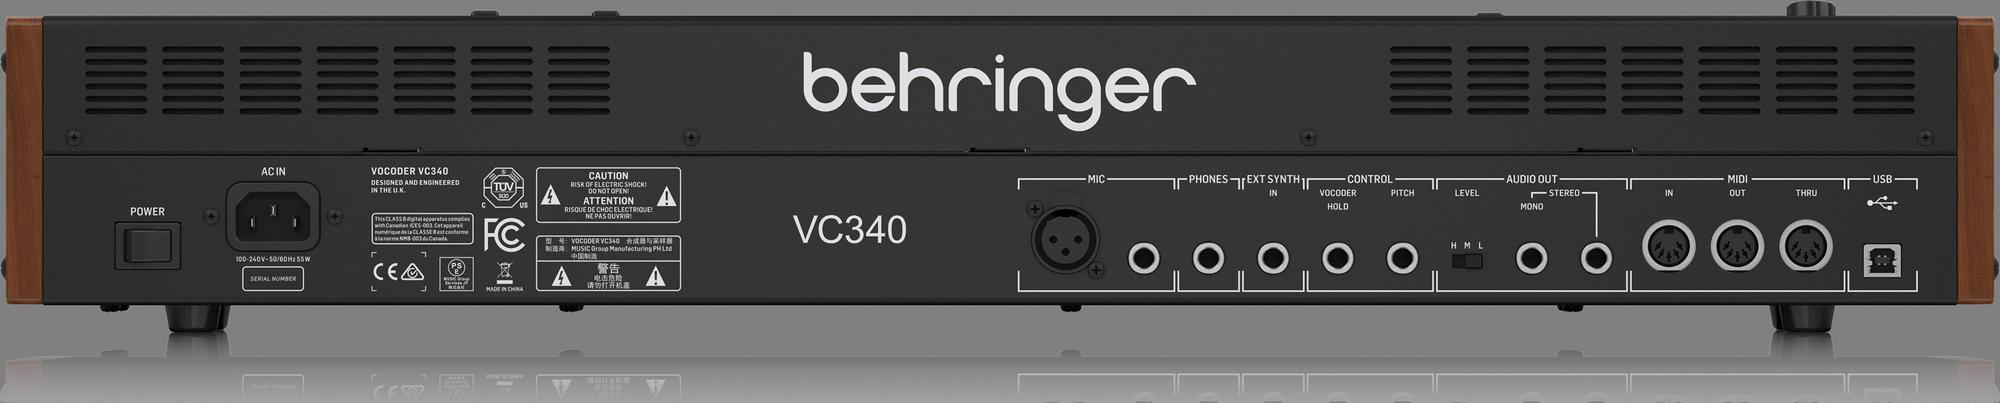 Behringer VOCODER VC340 - Analoge Vocoder